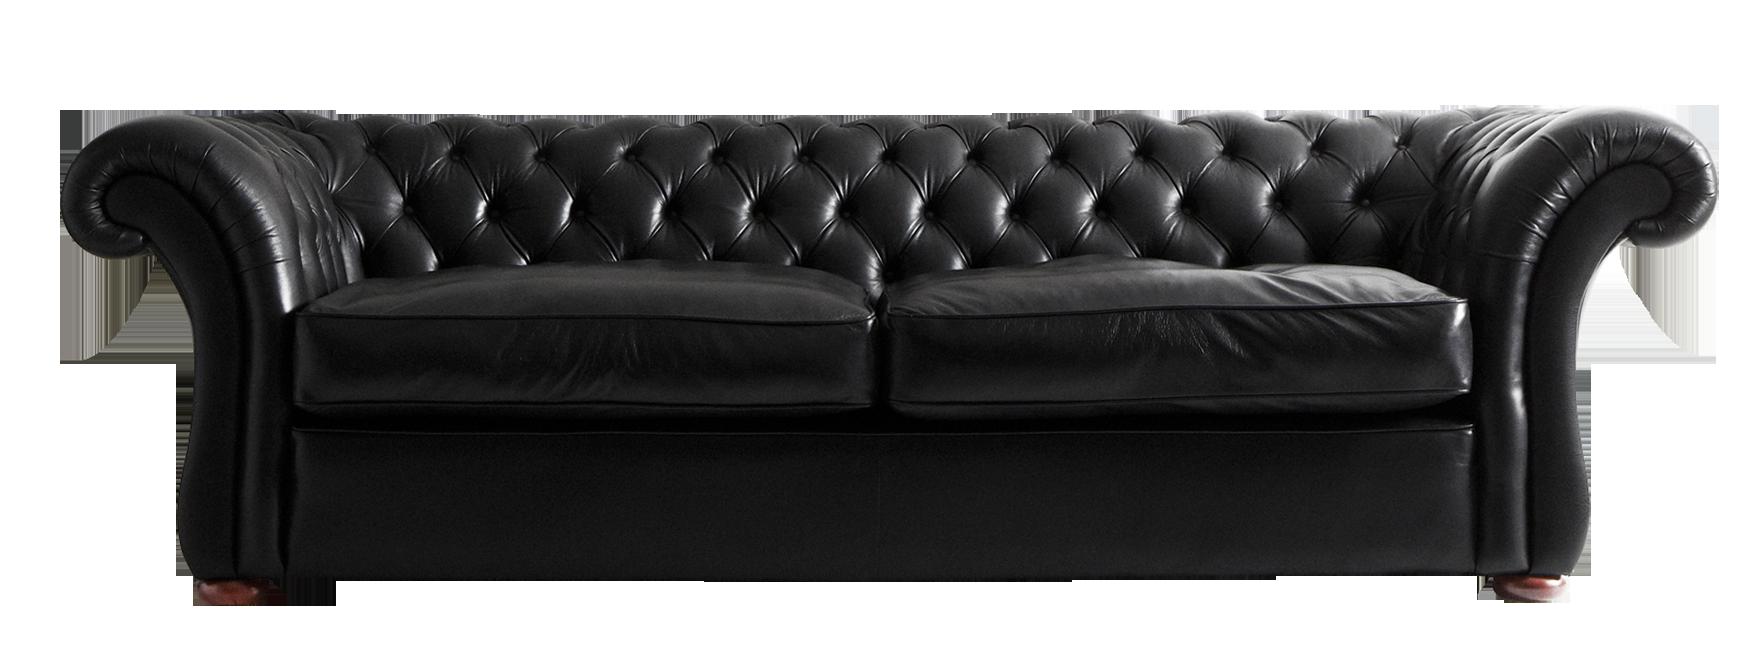 Sofa Png Image Purepng Free Transparent Cc0 Png Image Library